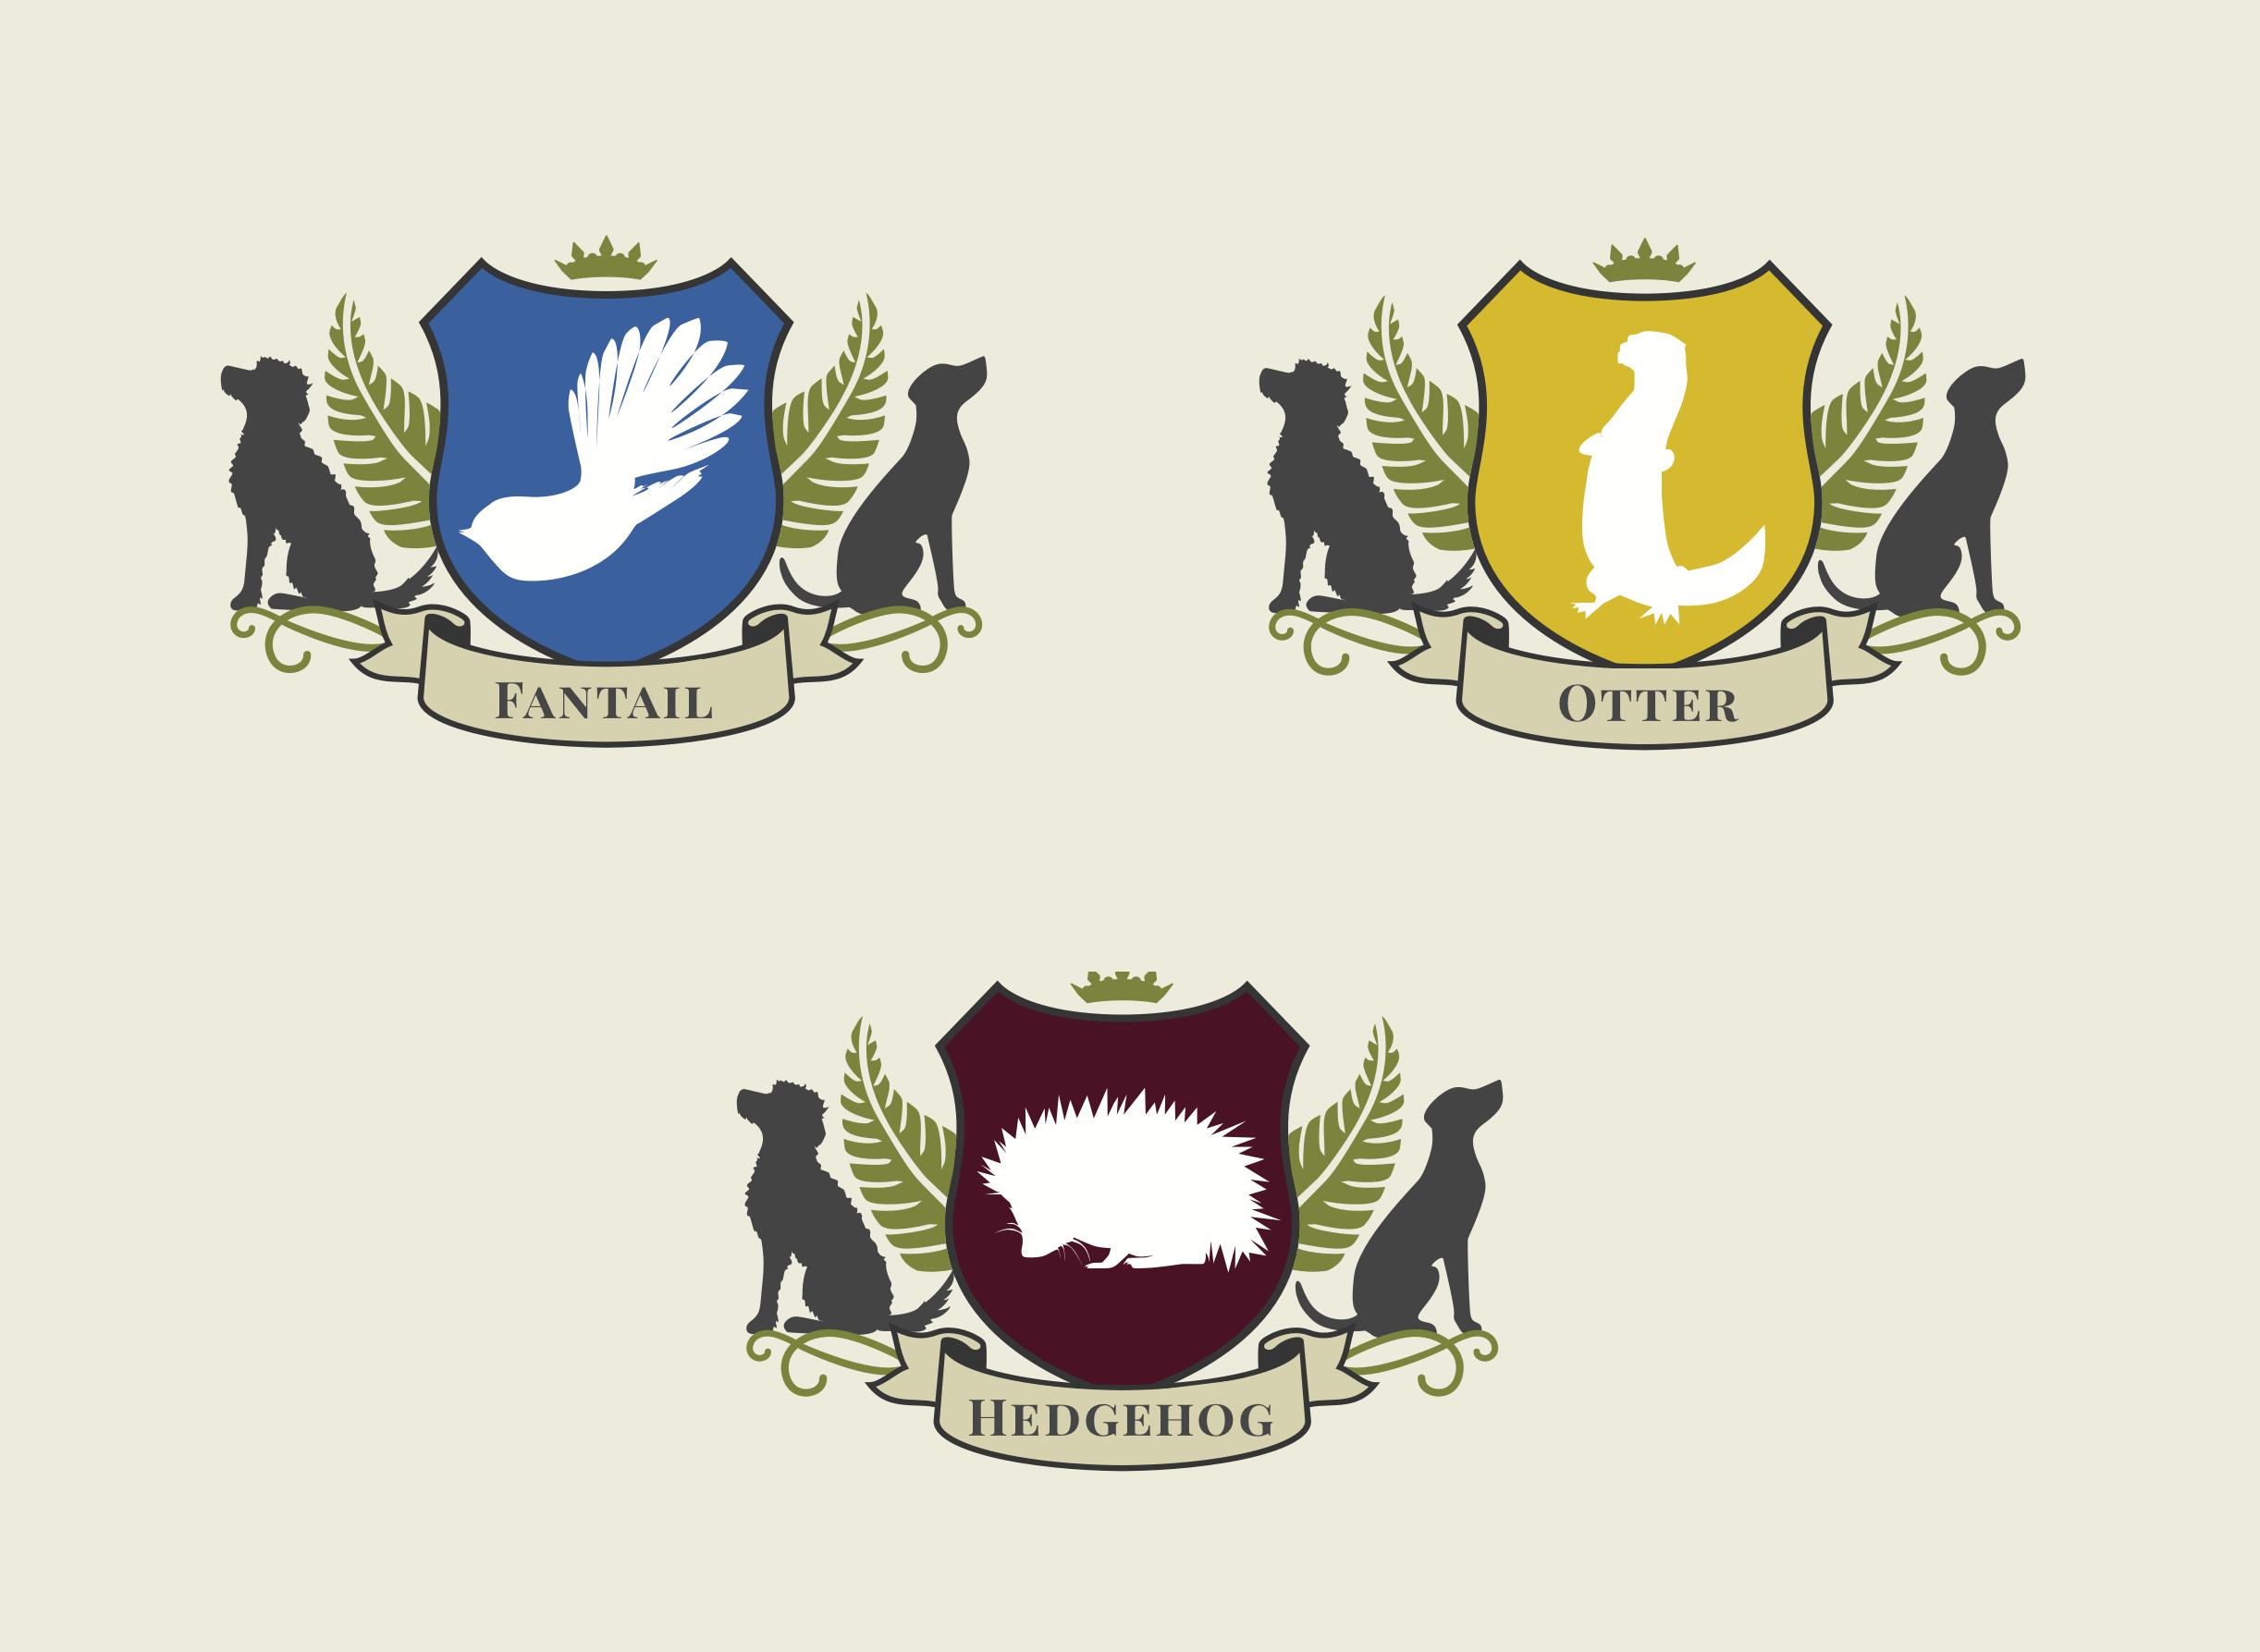 barkley-manor-house-logos.png